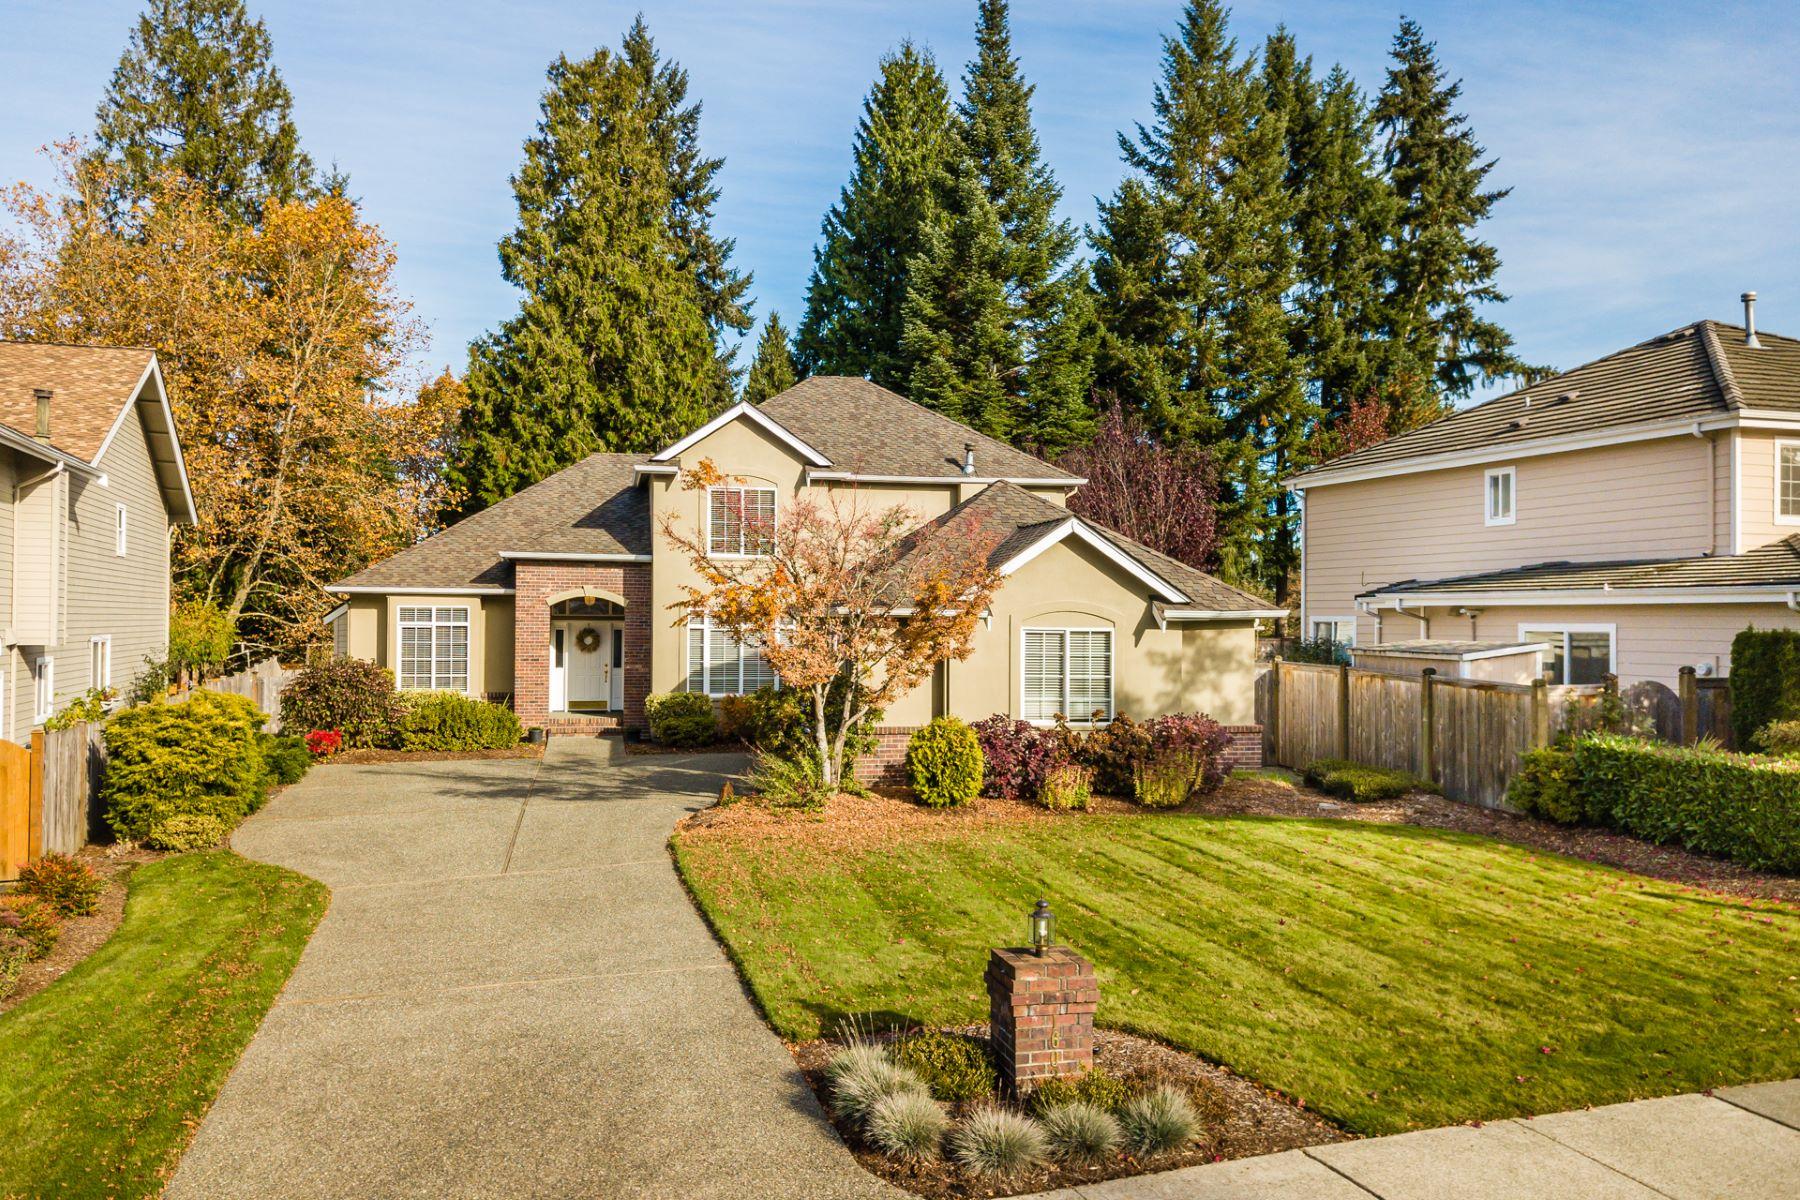 Single Family Homes for Sale at Prescott Platt Gem! 16032 NE 44th Ct Redmond, Washington 98052 United States